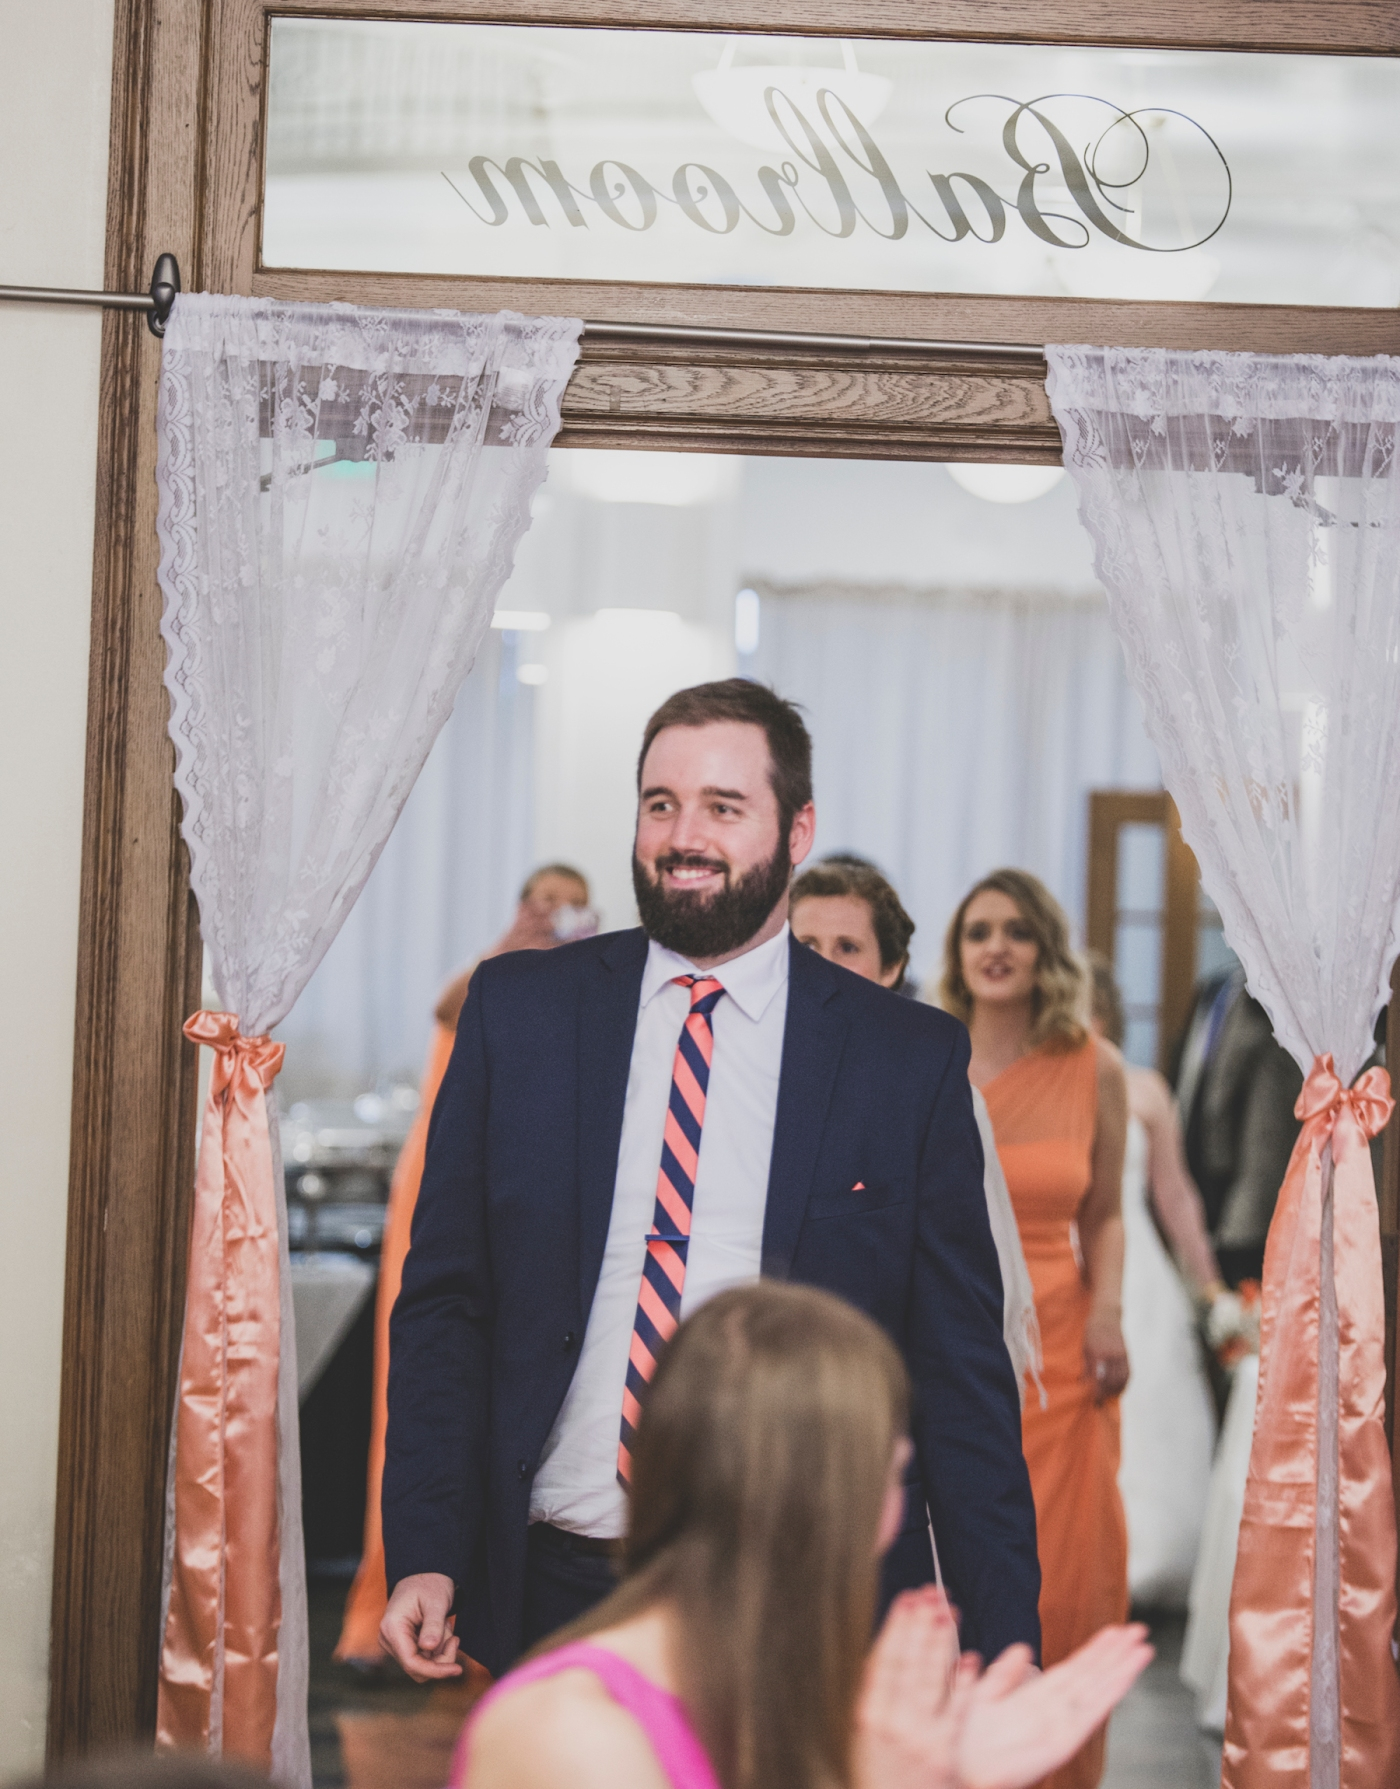 DSC_3129Everett_Wedding_Ballroom_Jane_Speleers_photography_Rachel_and_Edmund_reception_2017